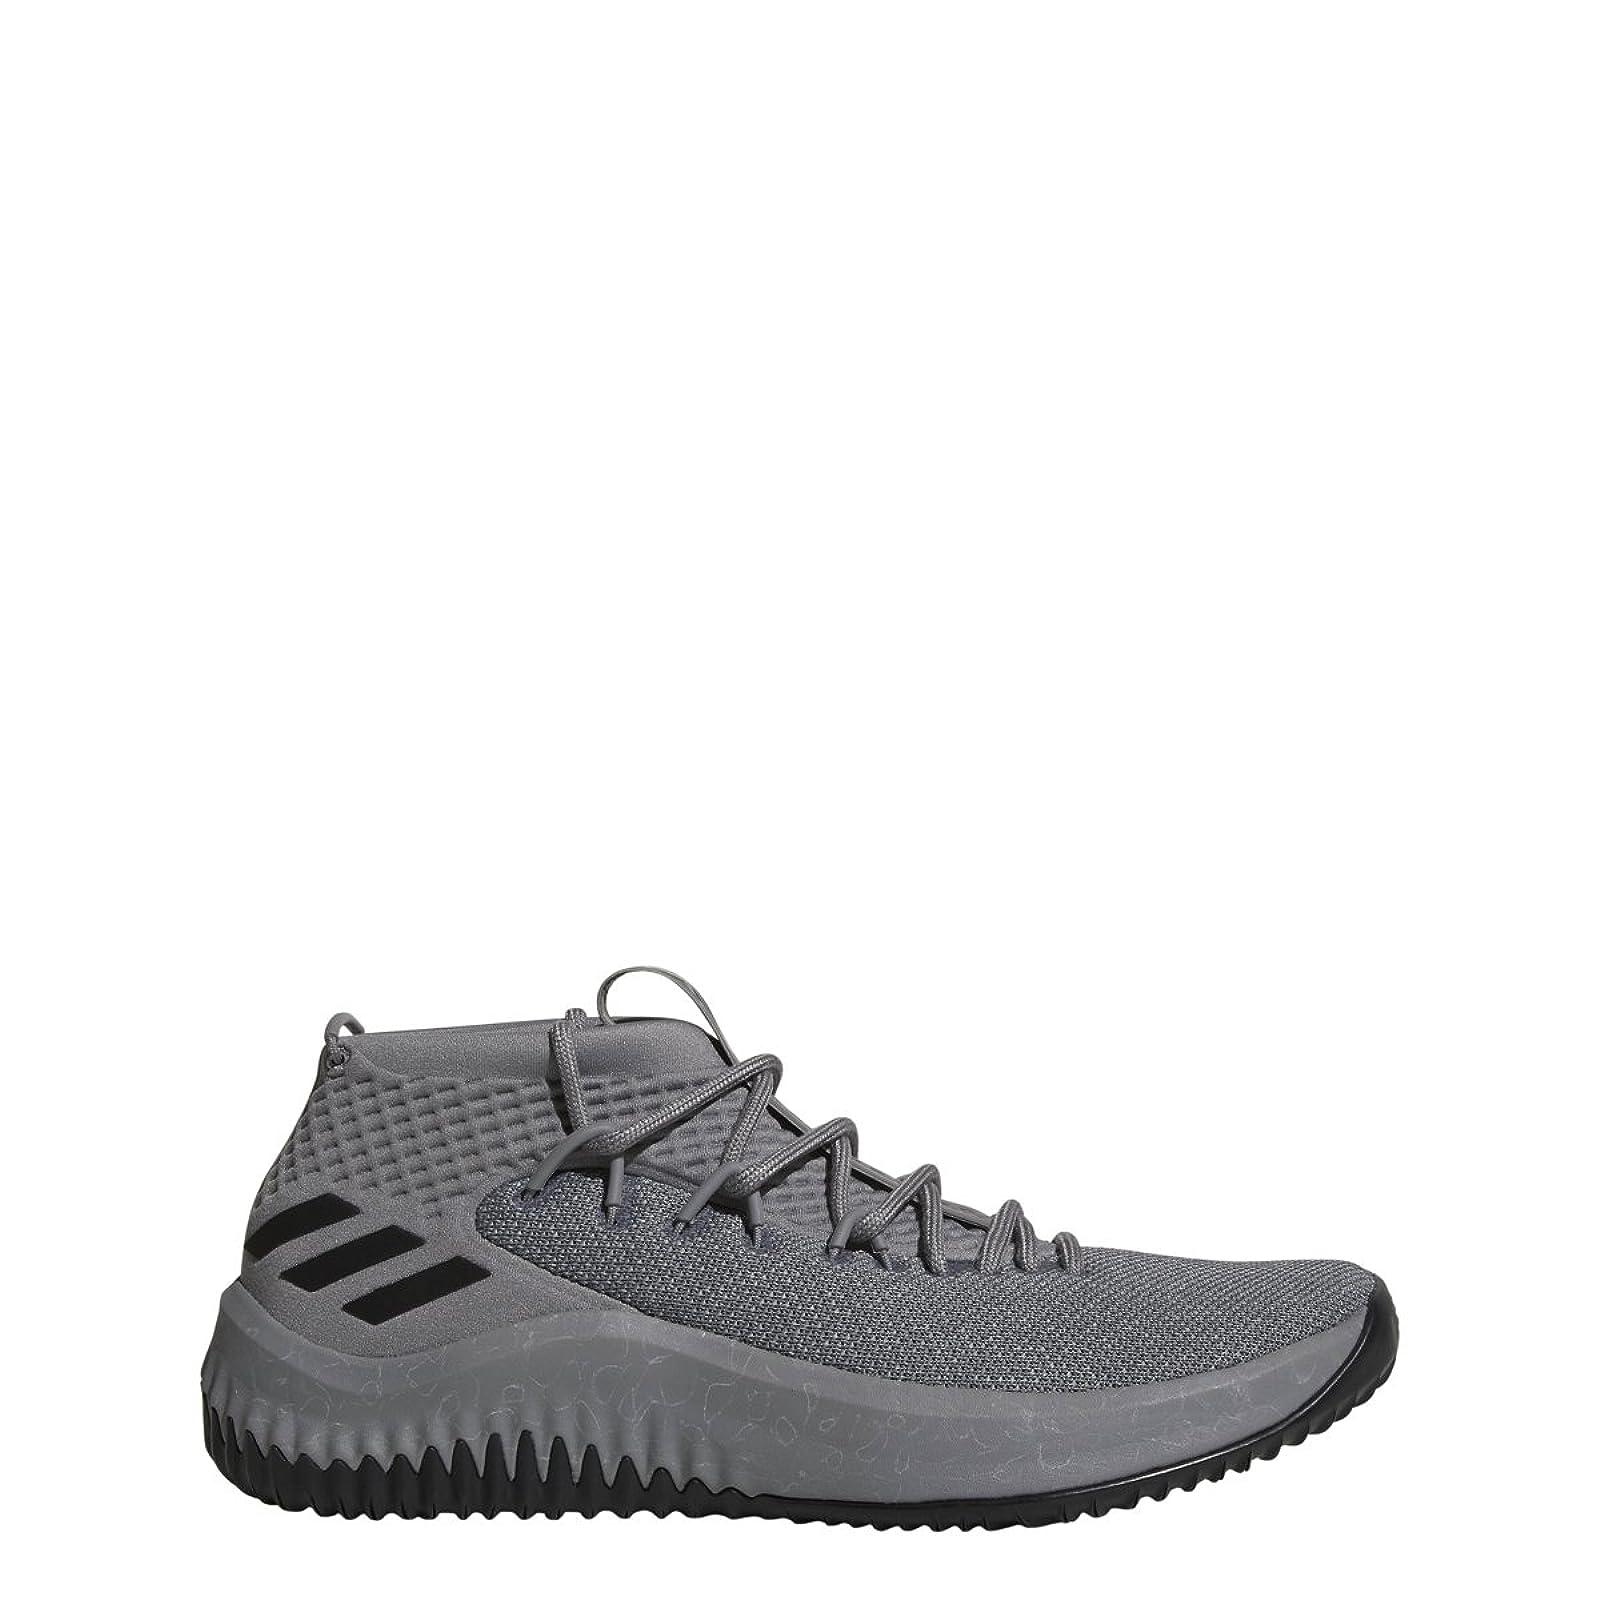 adidas Men's Crazy Time II Football CQ0474 Grey Three/Core Black/Grey Two - 1